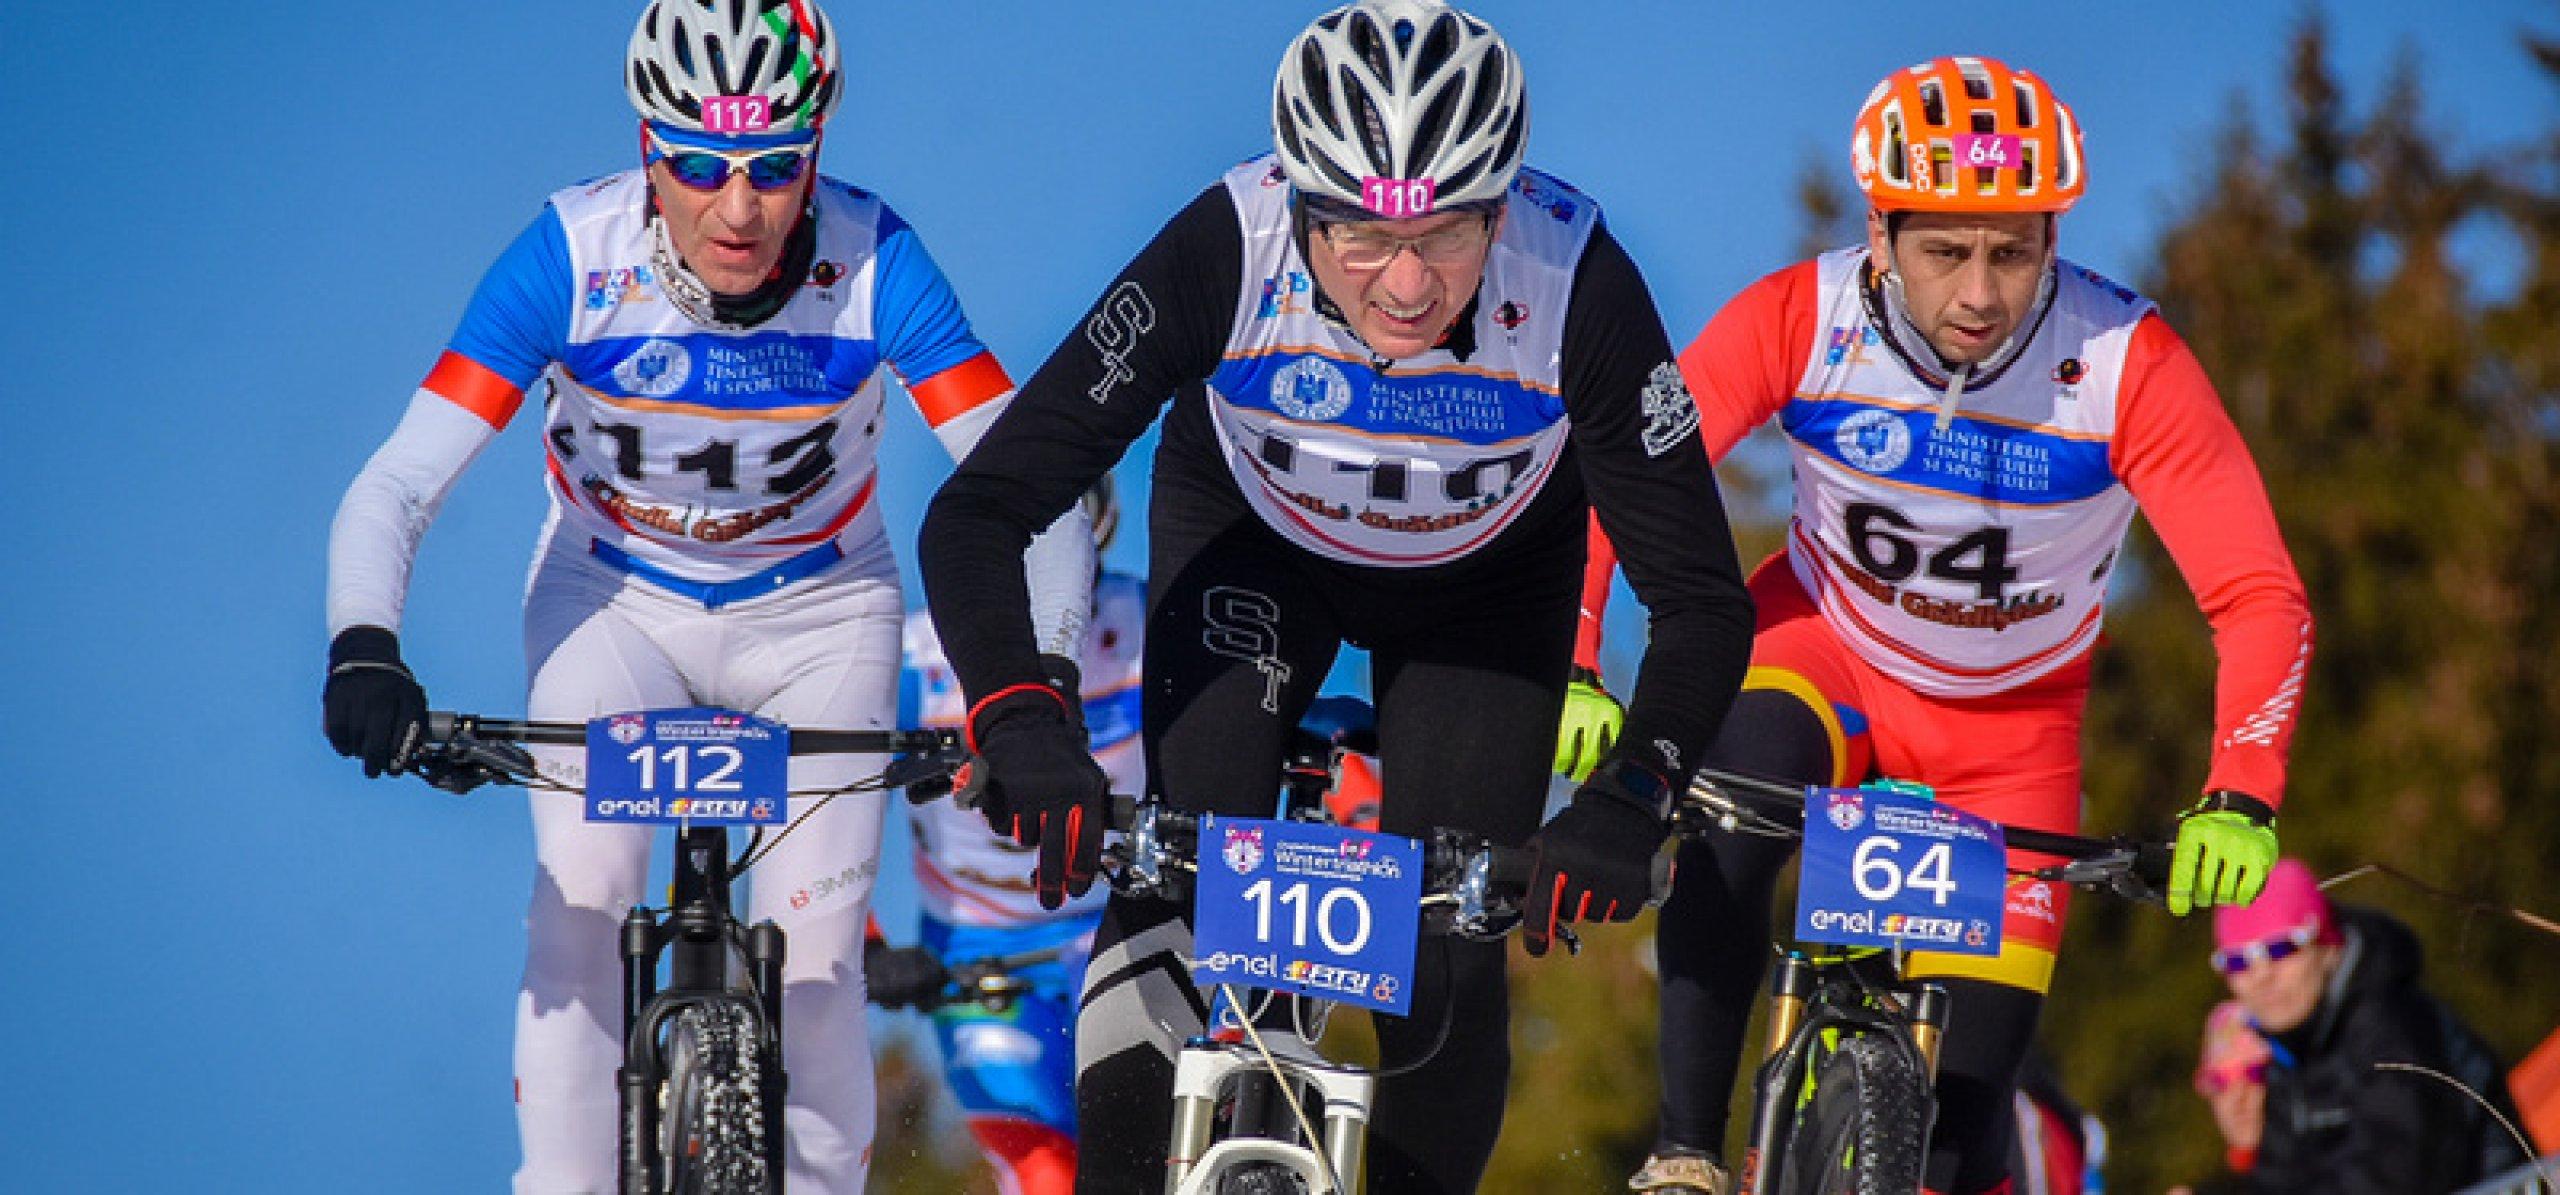 wintertriathlon-cheile-gradistei-traseul-de-bicicleta